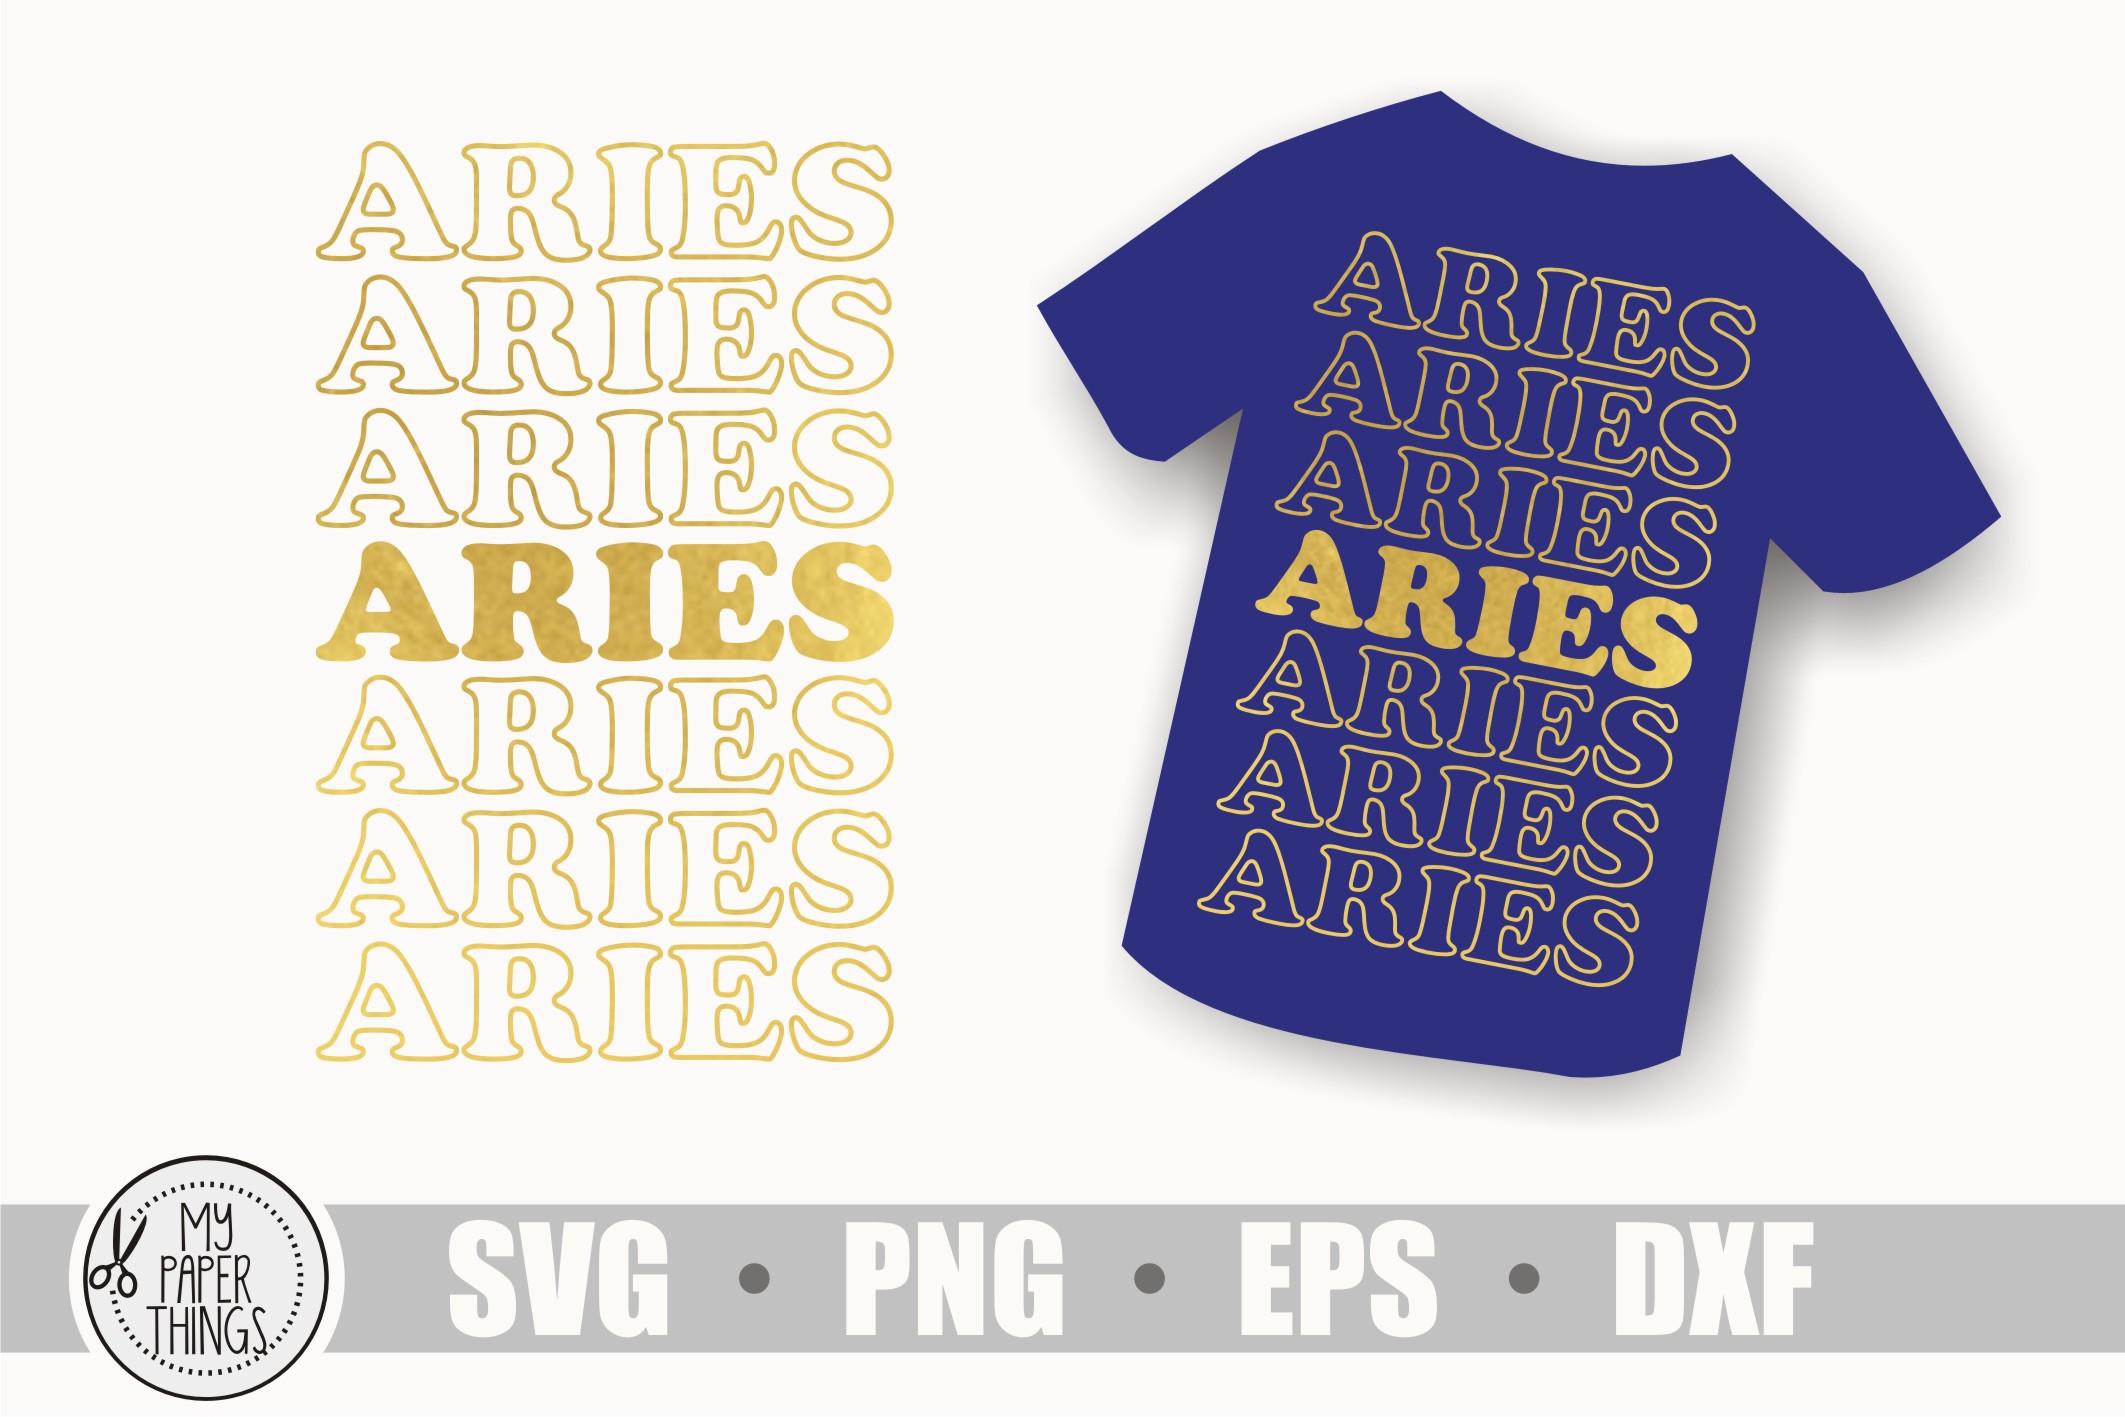 Aries svg bundle, Birthday svg, Zodiac sign example image 11